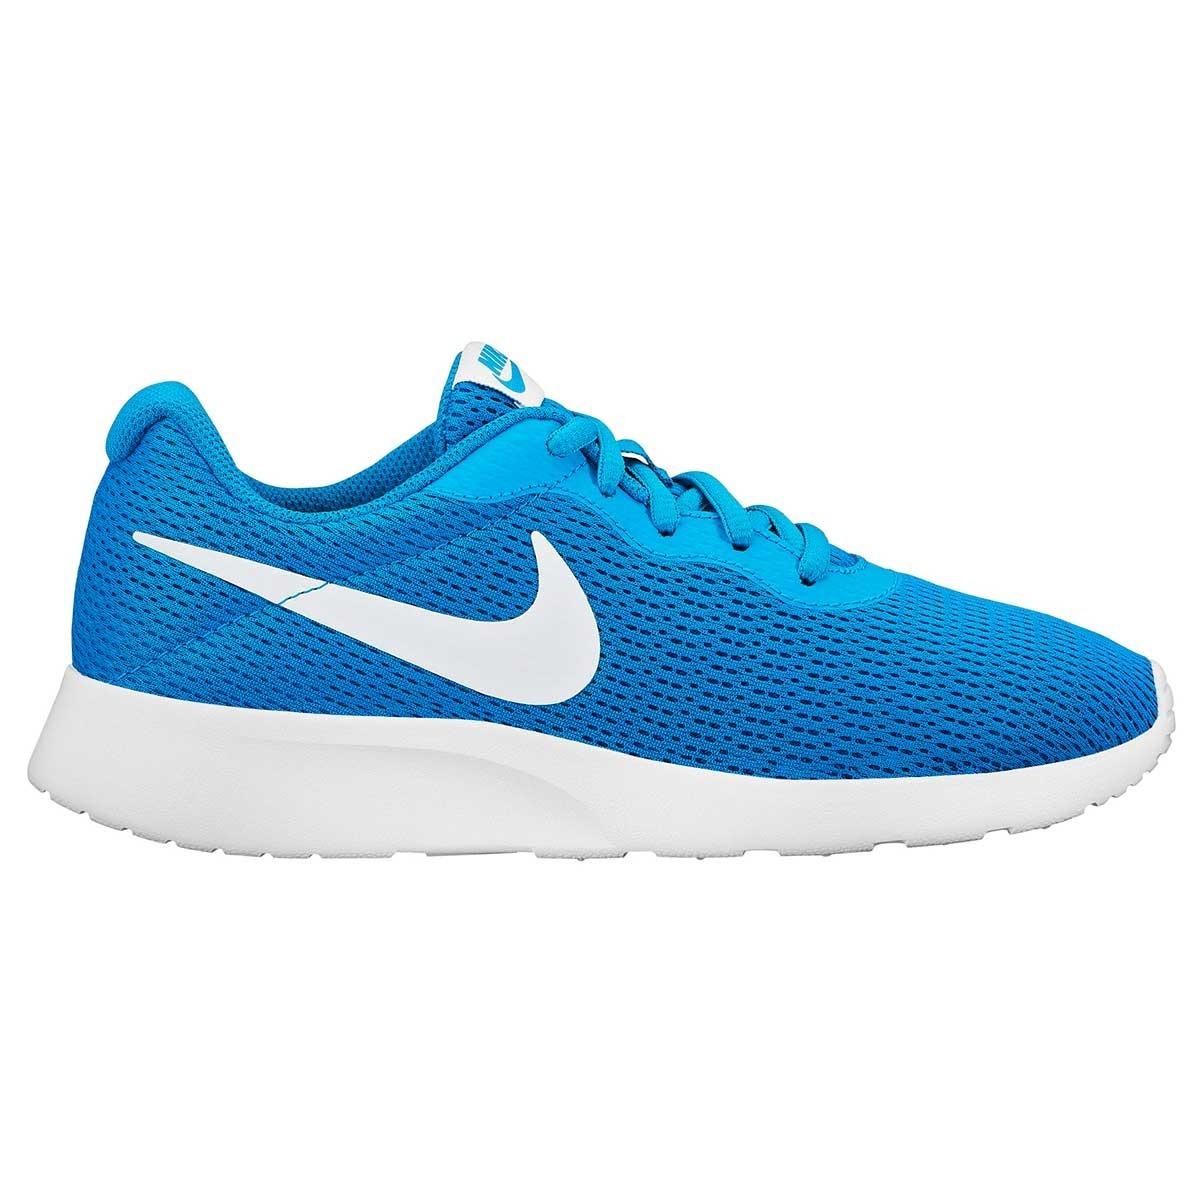 c8acd01e738 tenis nike de dama originales azul 812655-405+ envio dgt. Cargando zoom.